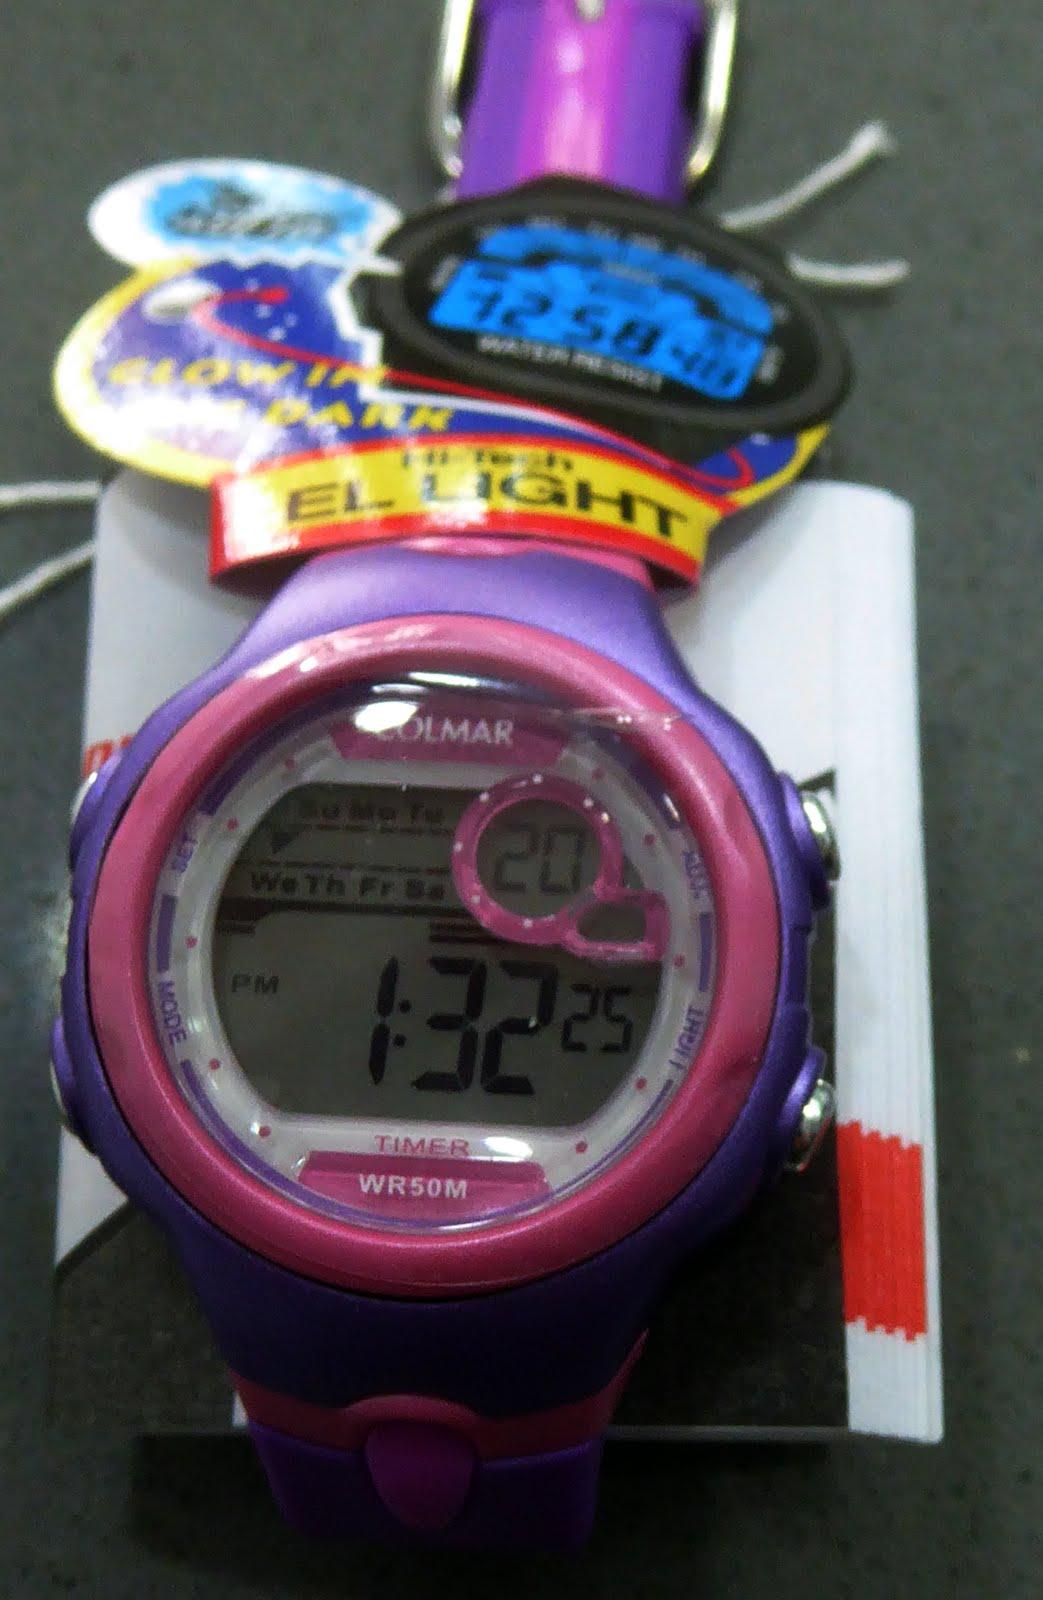 Reloj digital Colmar para chica